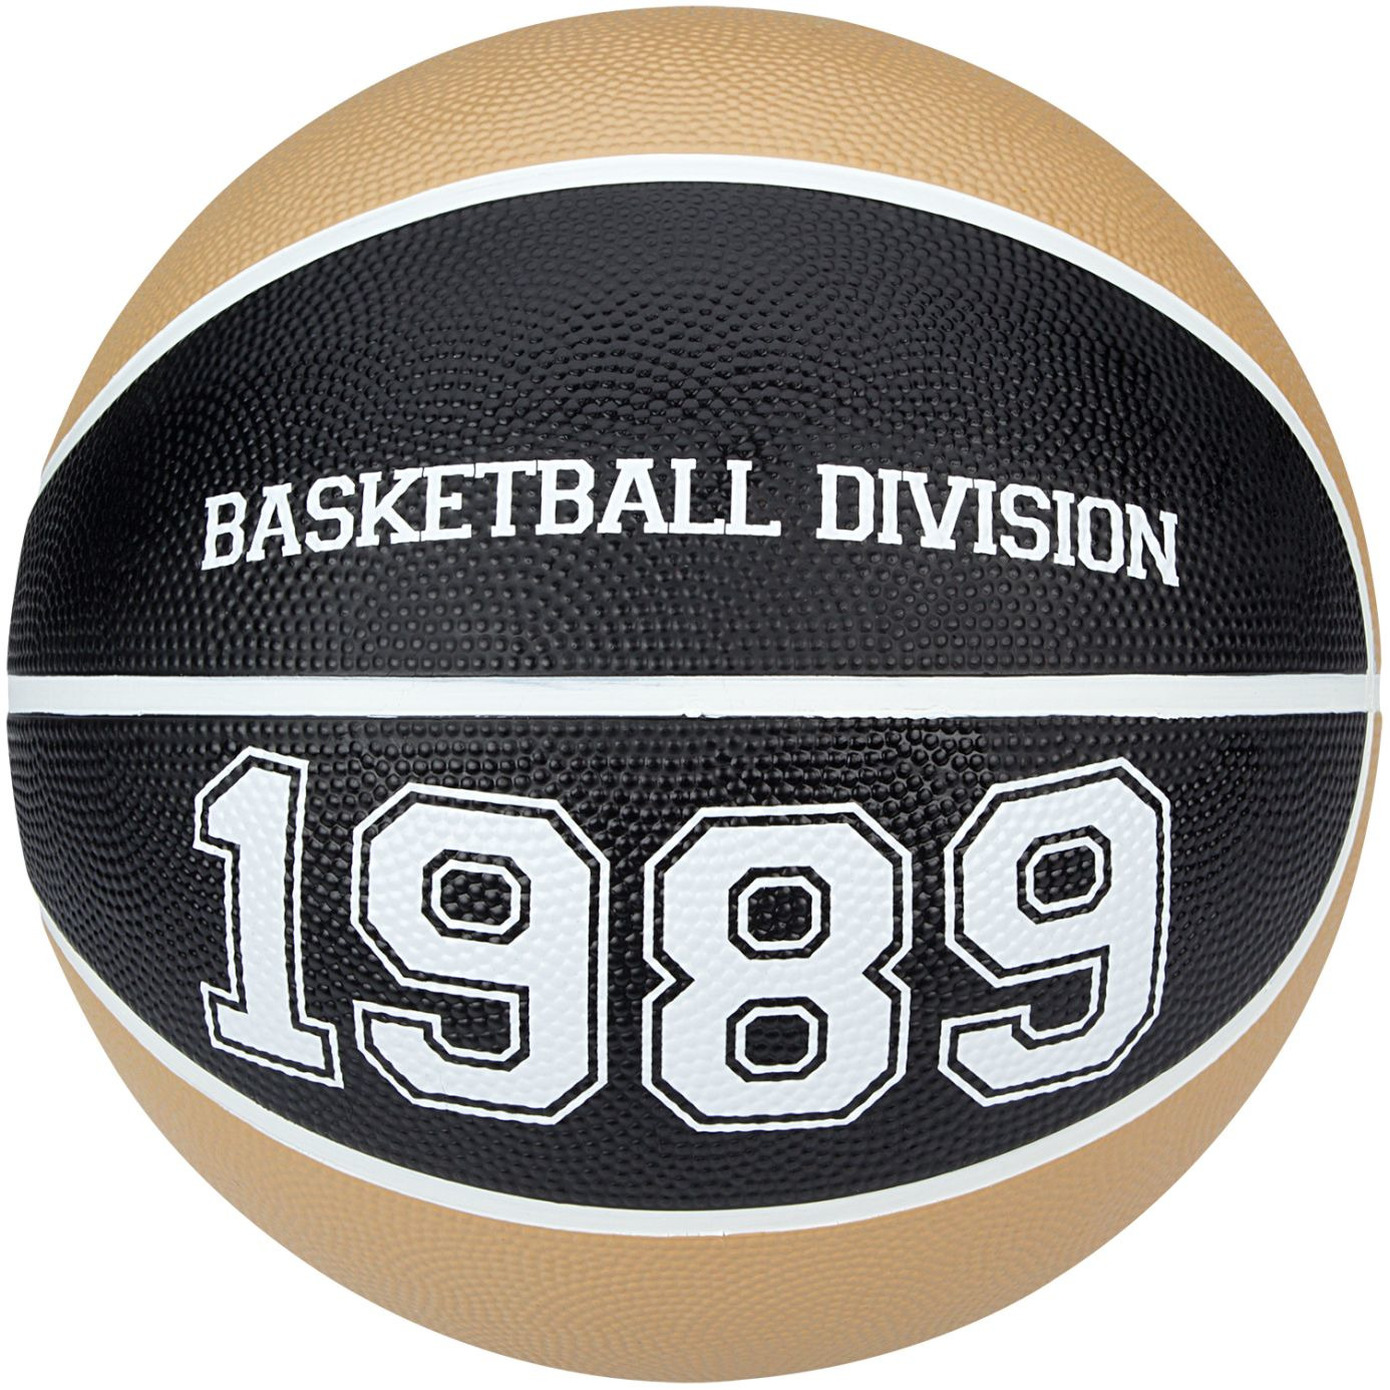 Speelgoed basketbal beige/zwart 23 cm